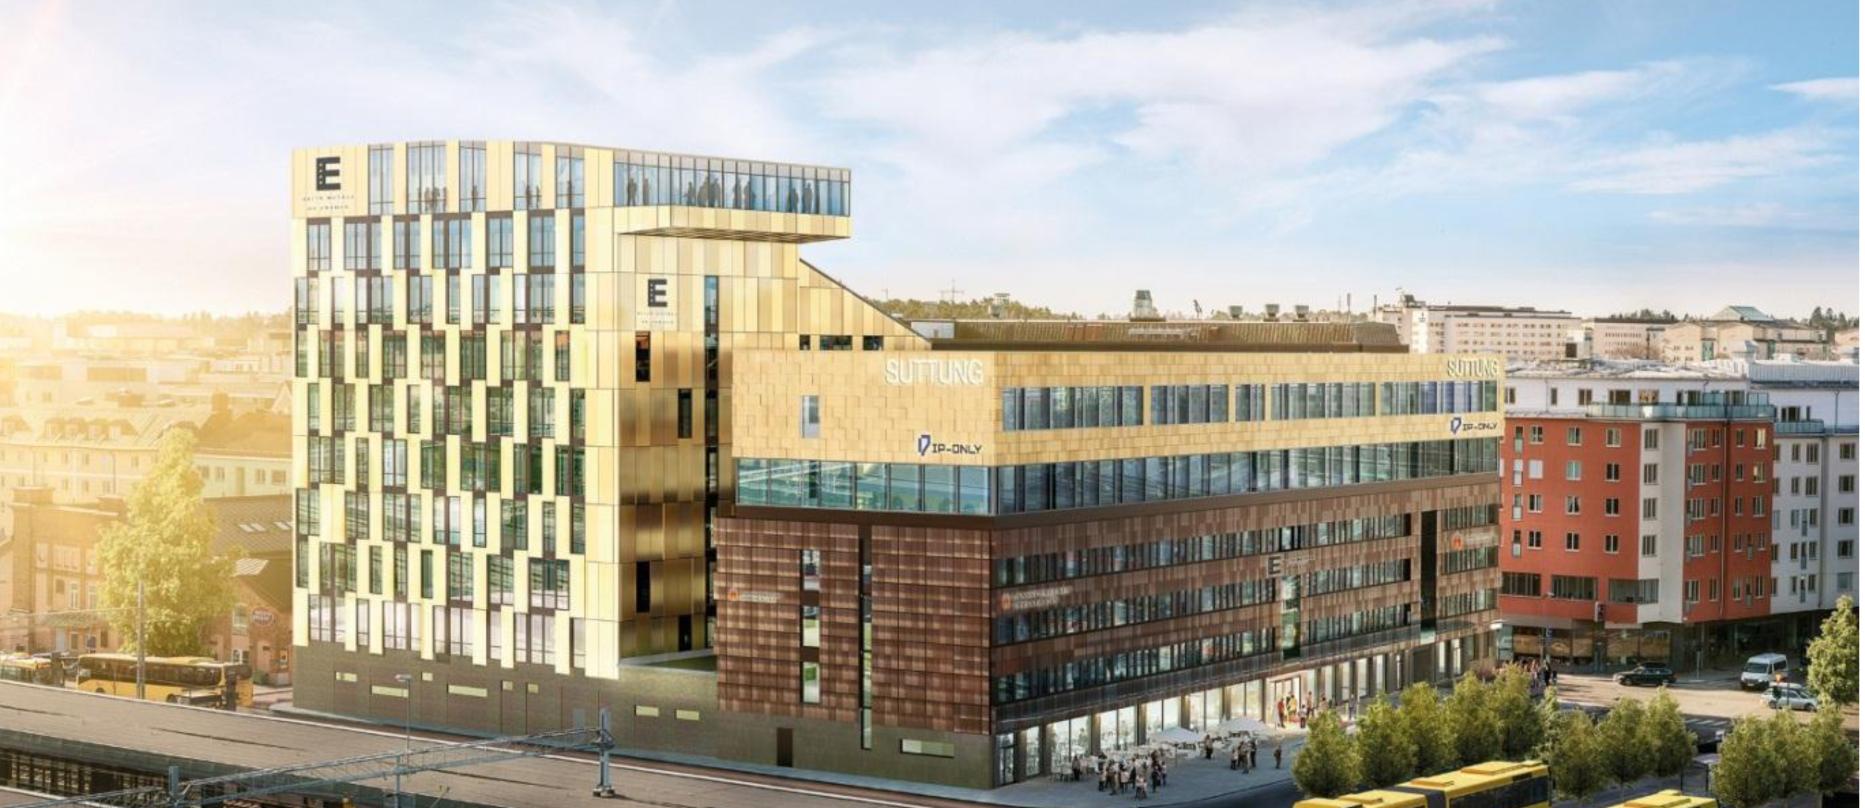 swedbank uppsala öppettider